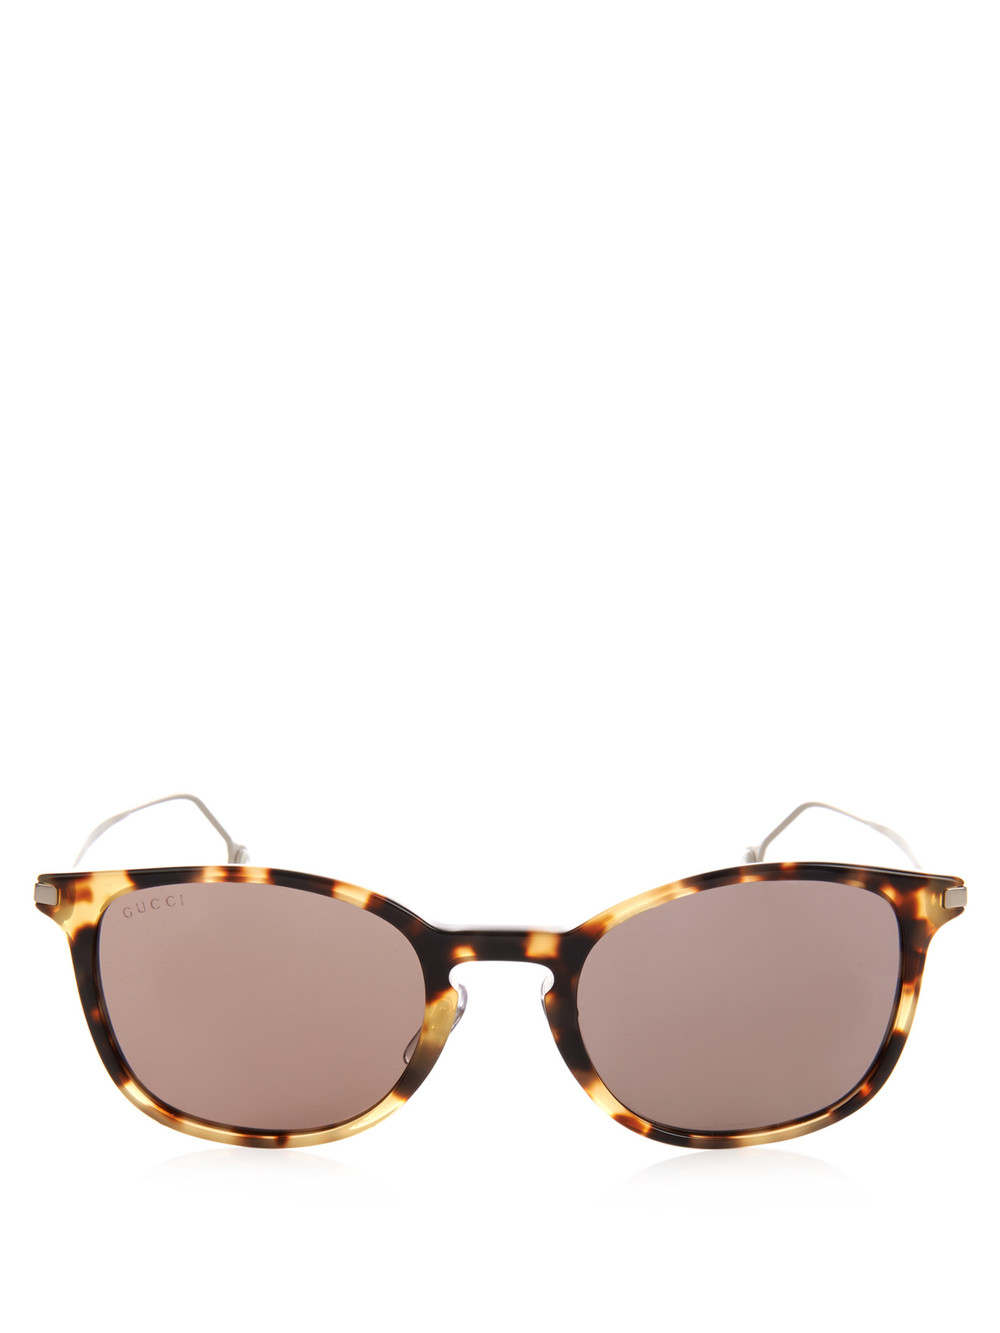 Amazoncom gucci eyeglasses